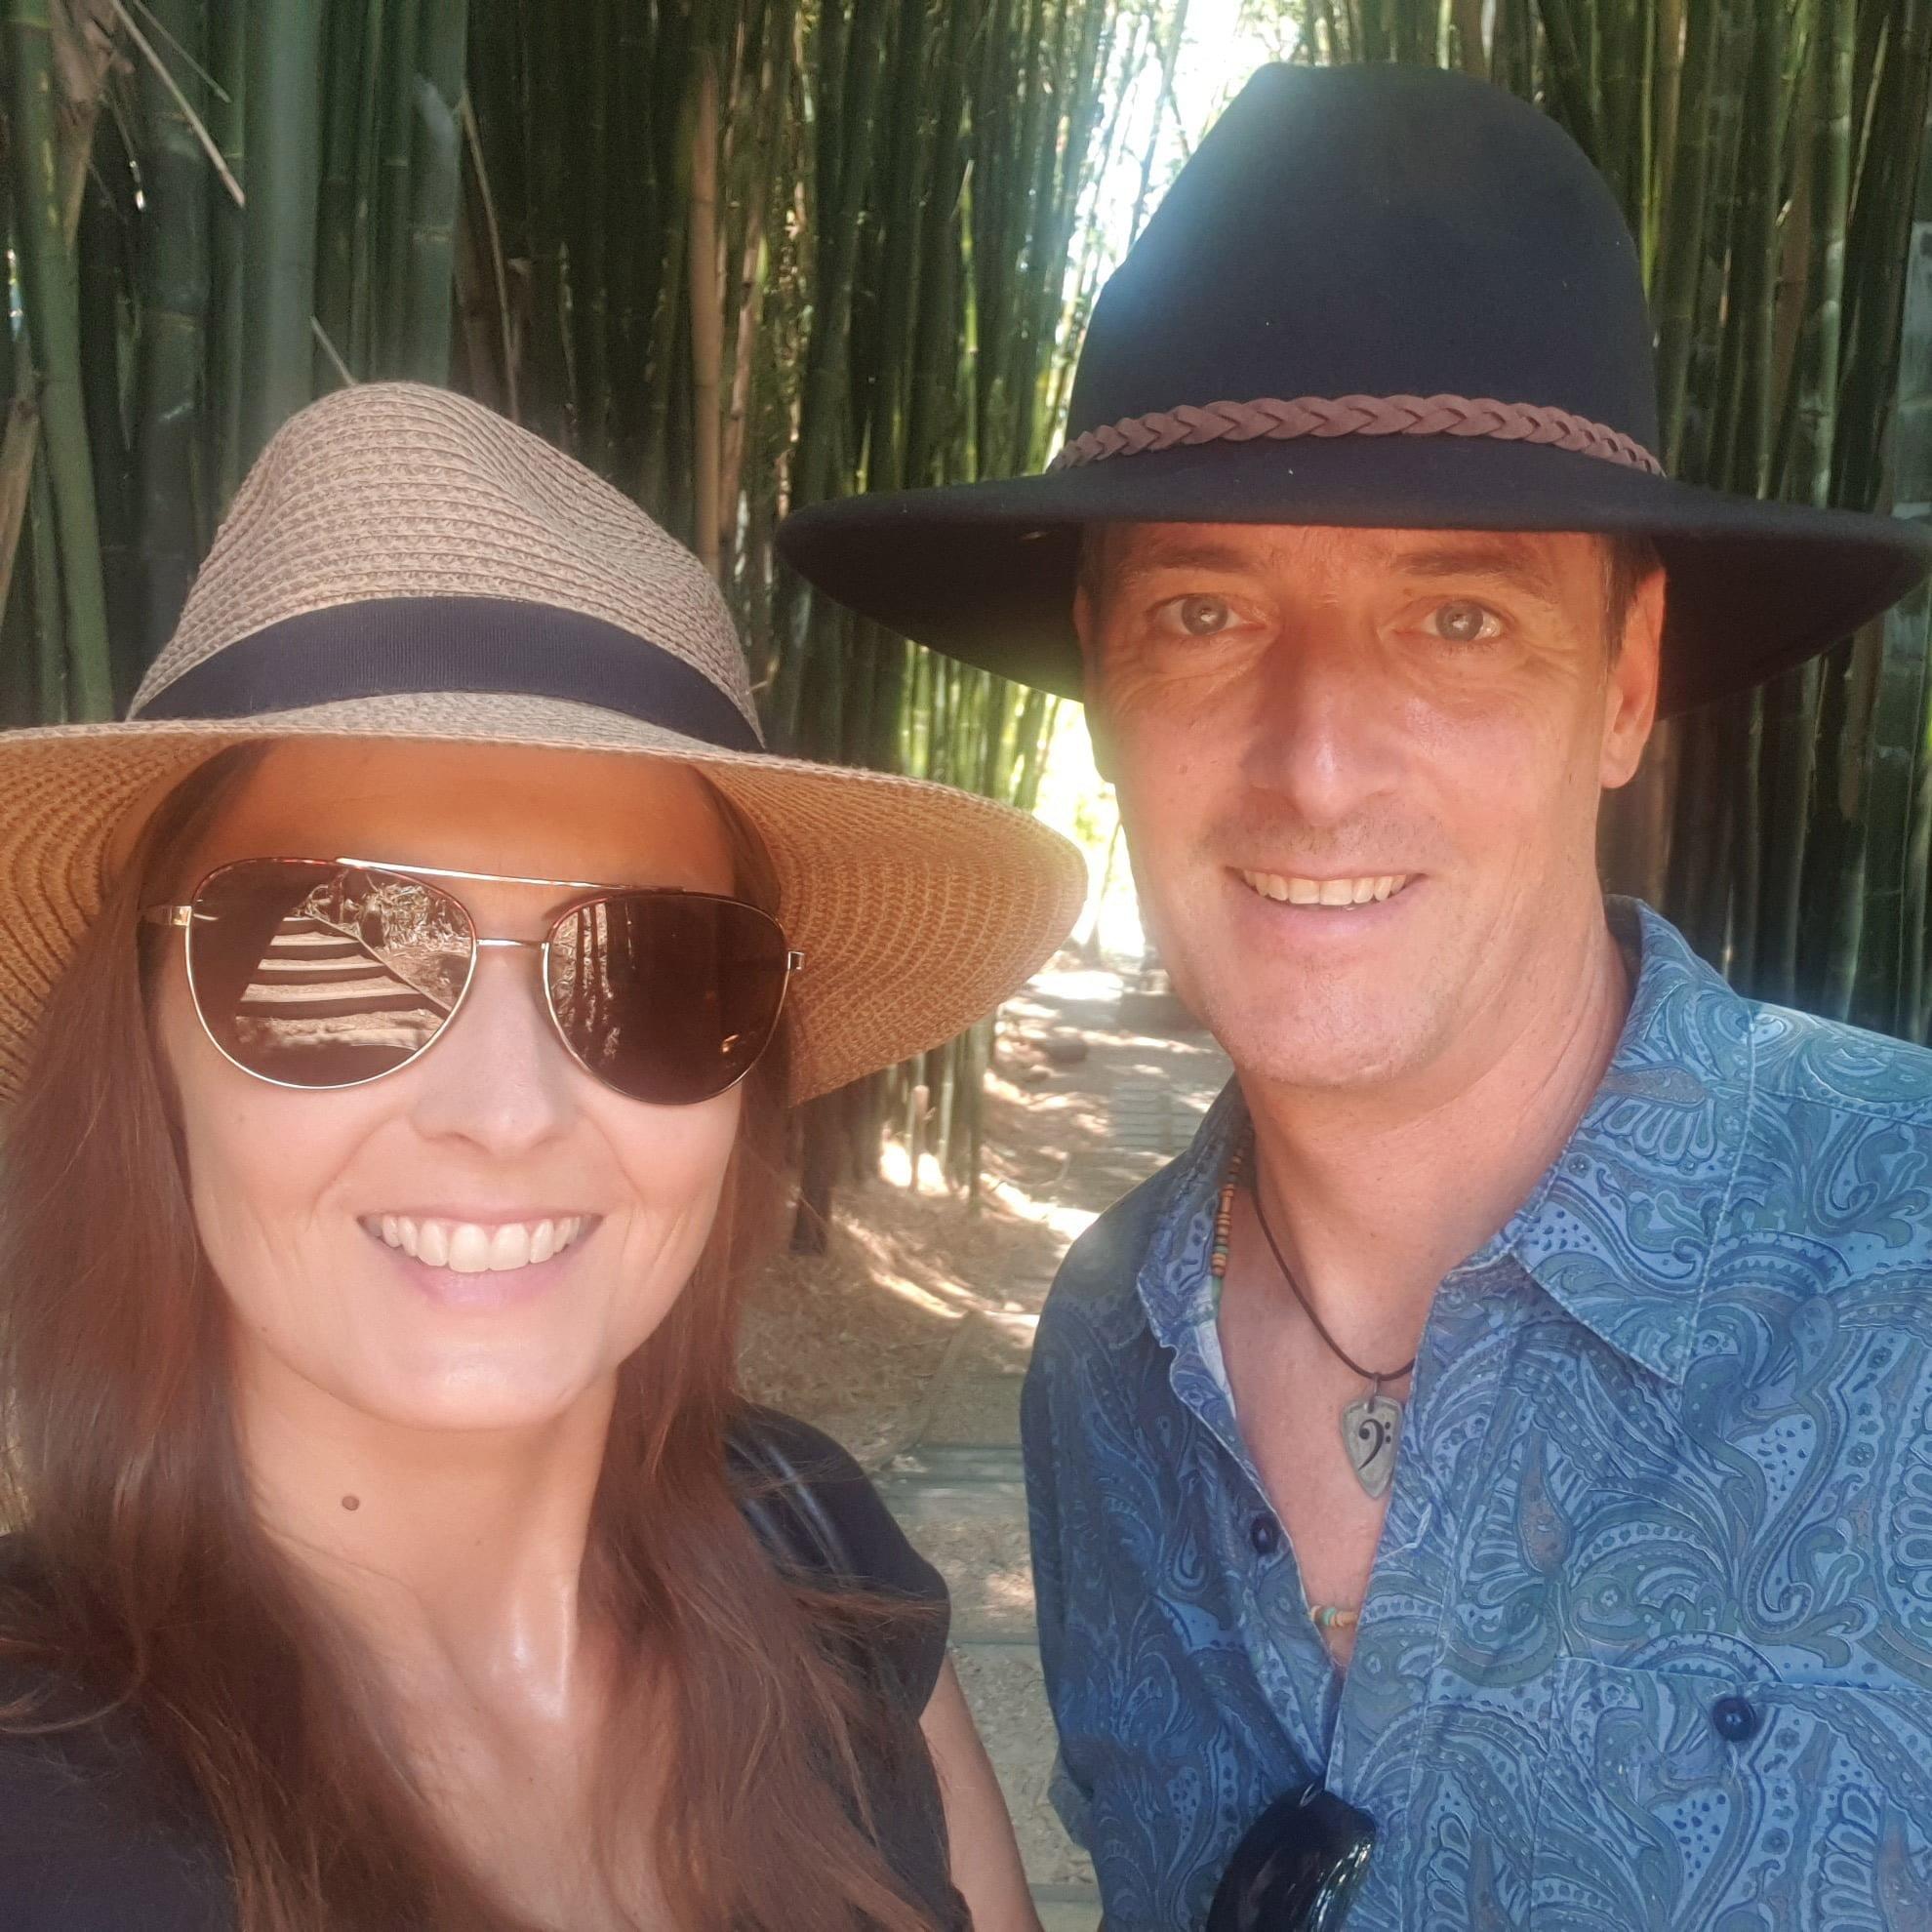 Sun hat, Vision care, Clothing, Smile, Face, Skin, Glasses, Goggles, Vertebrate